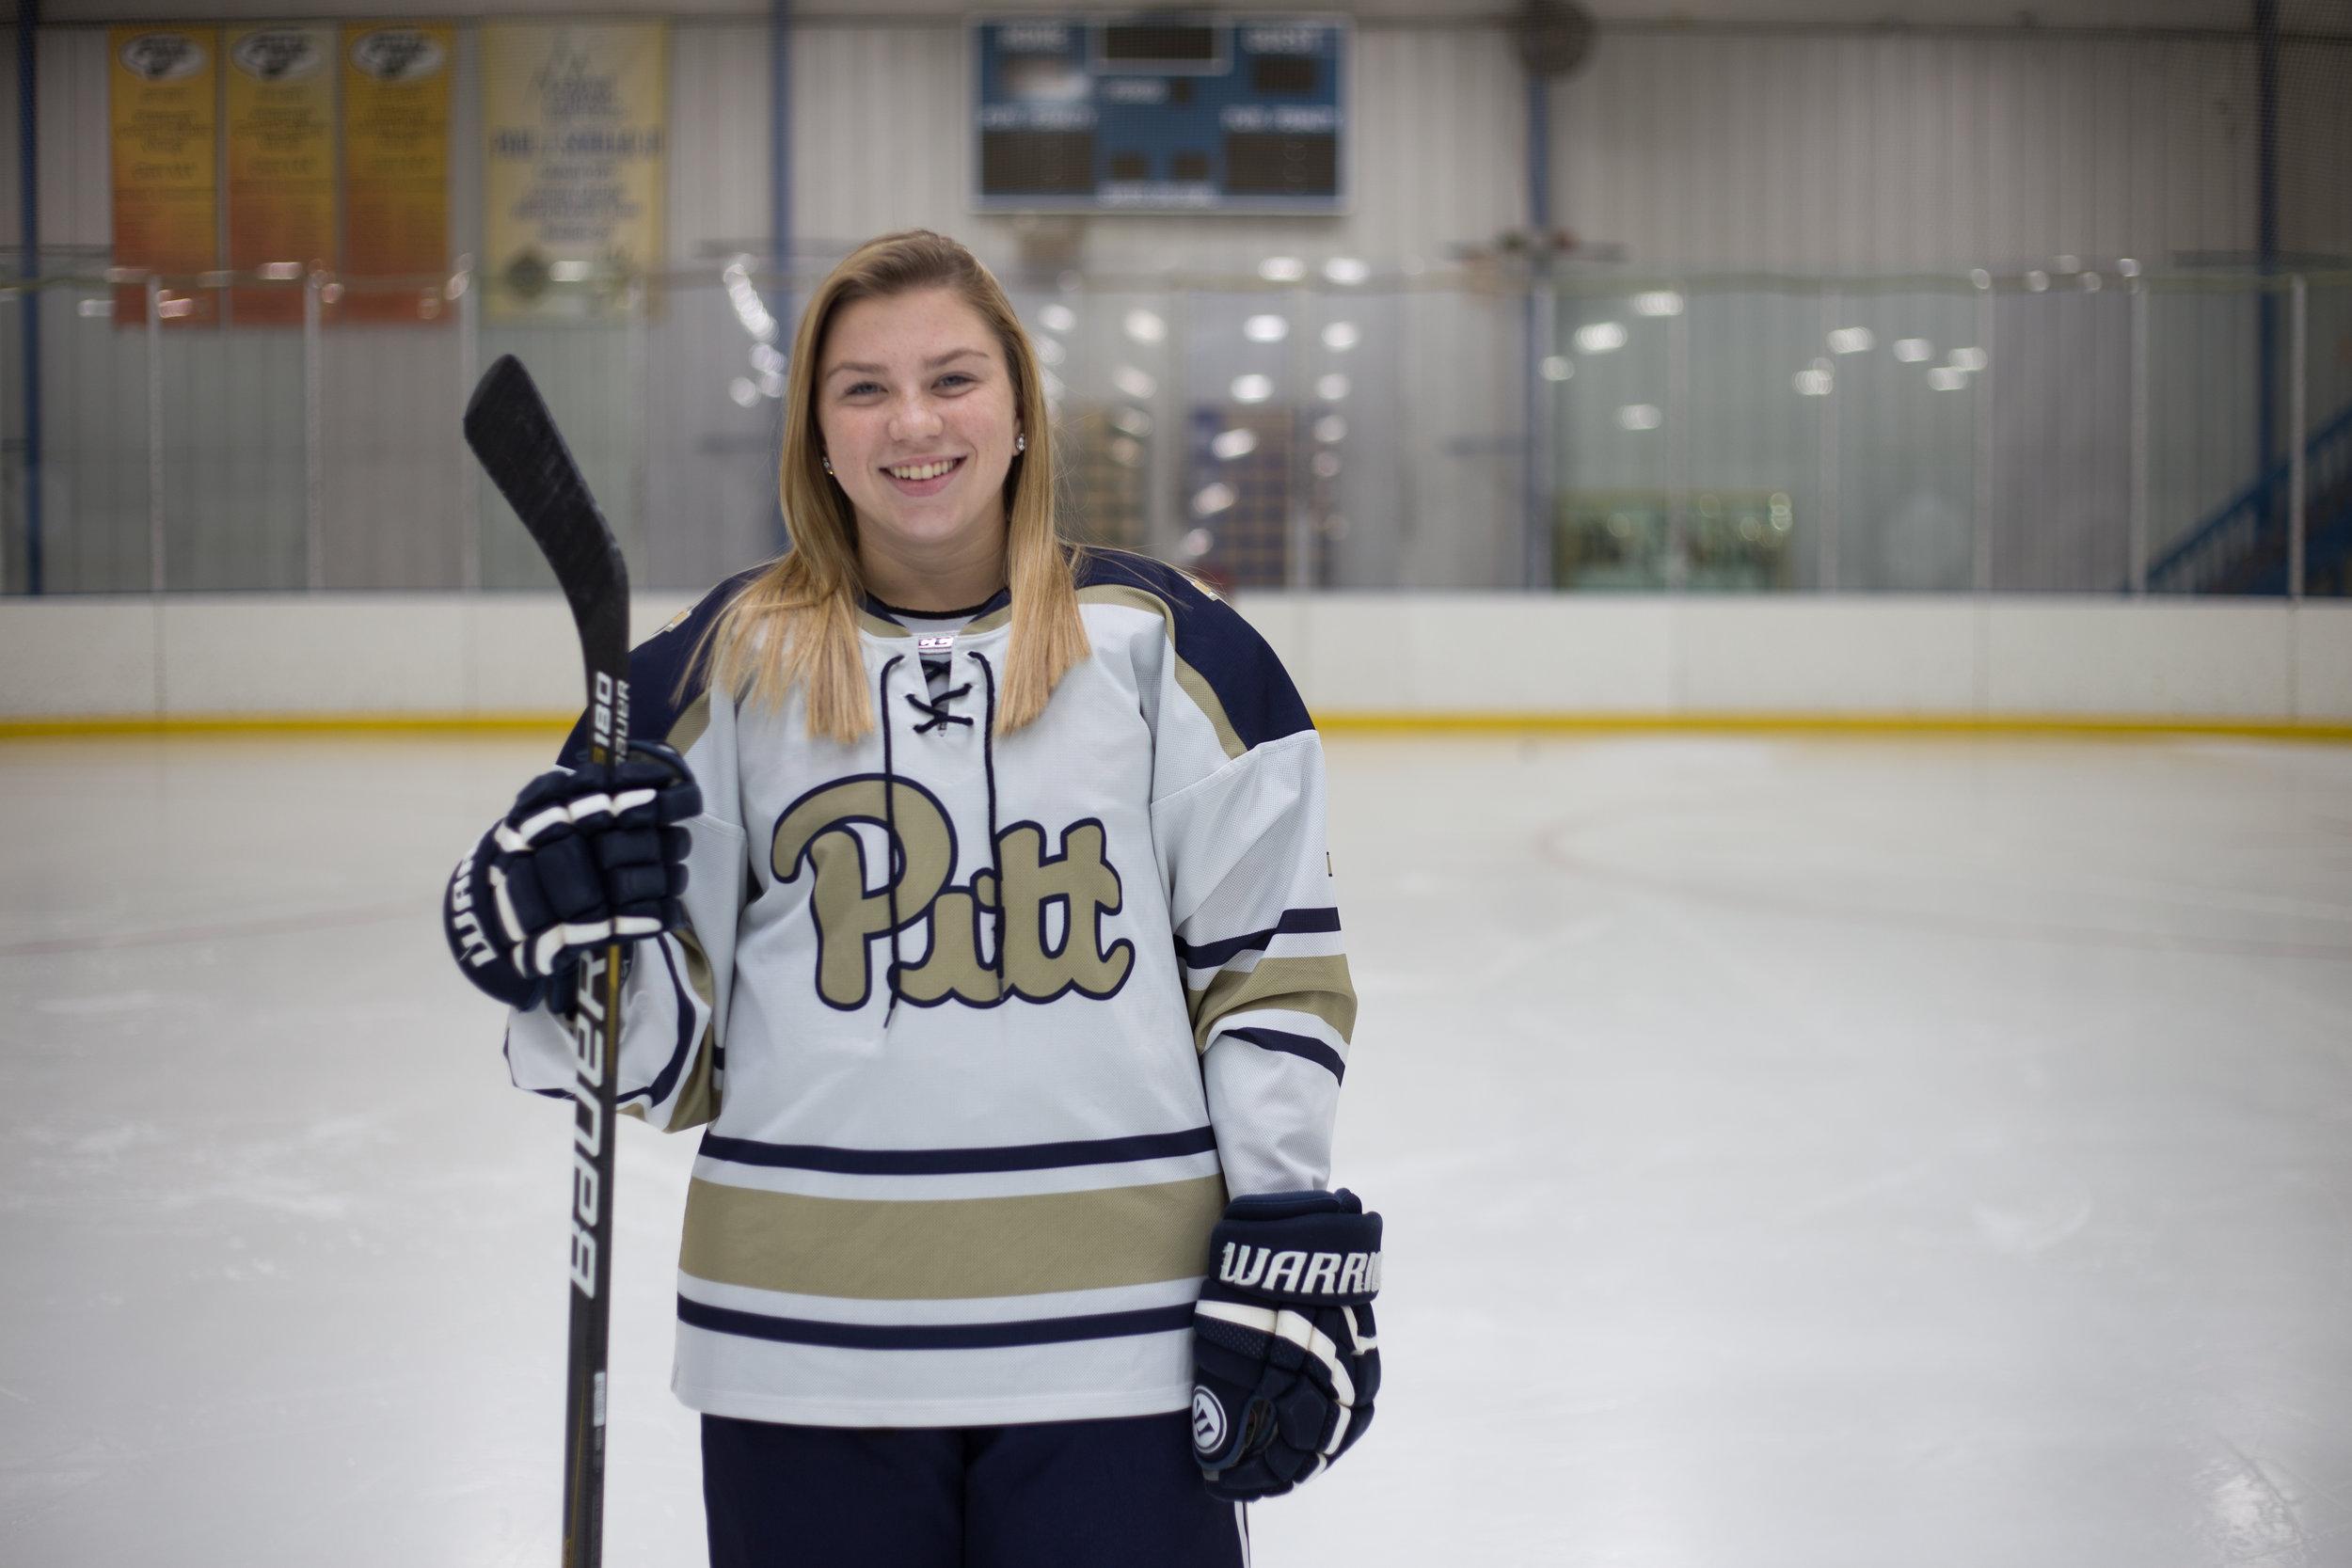 hockeyPortraits-17.JPG